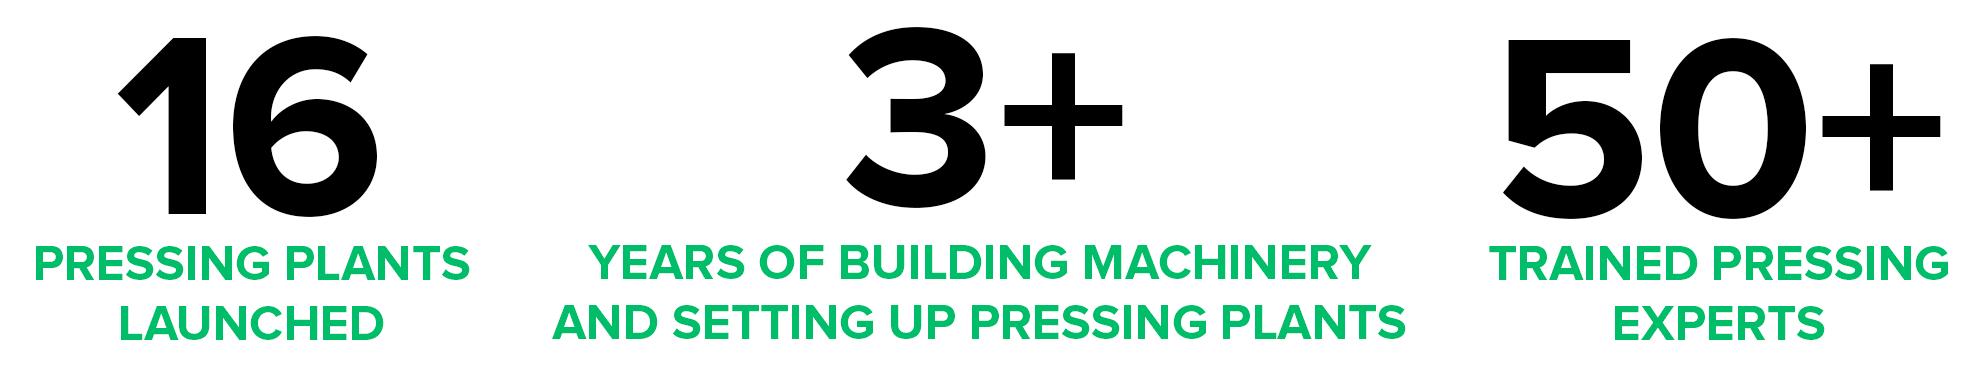 press_stats.png